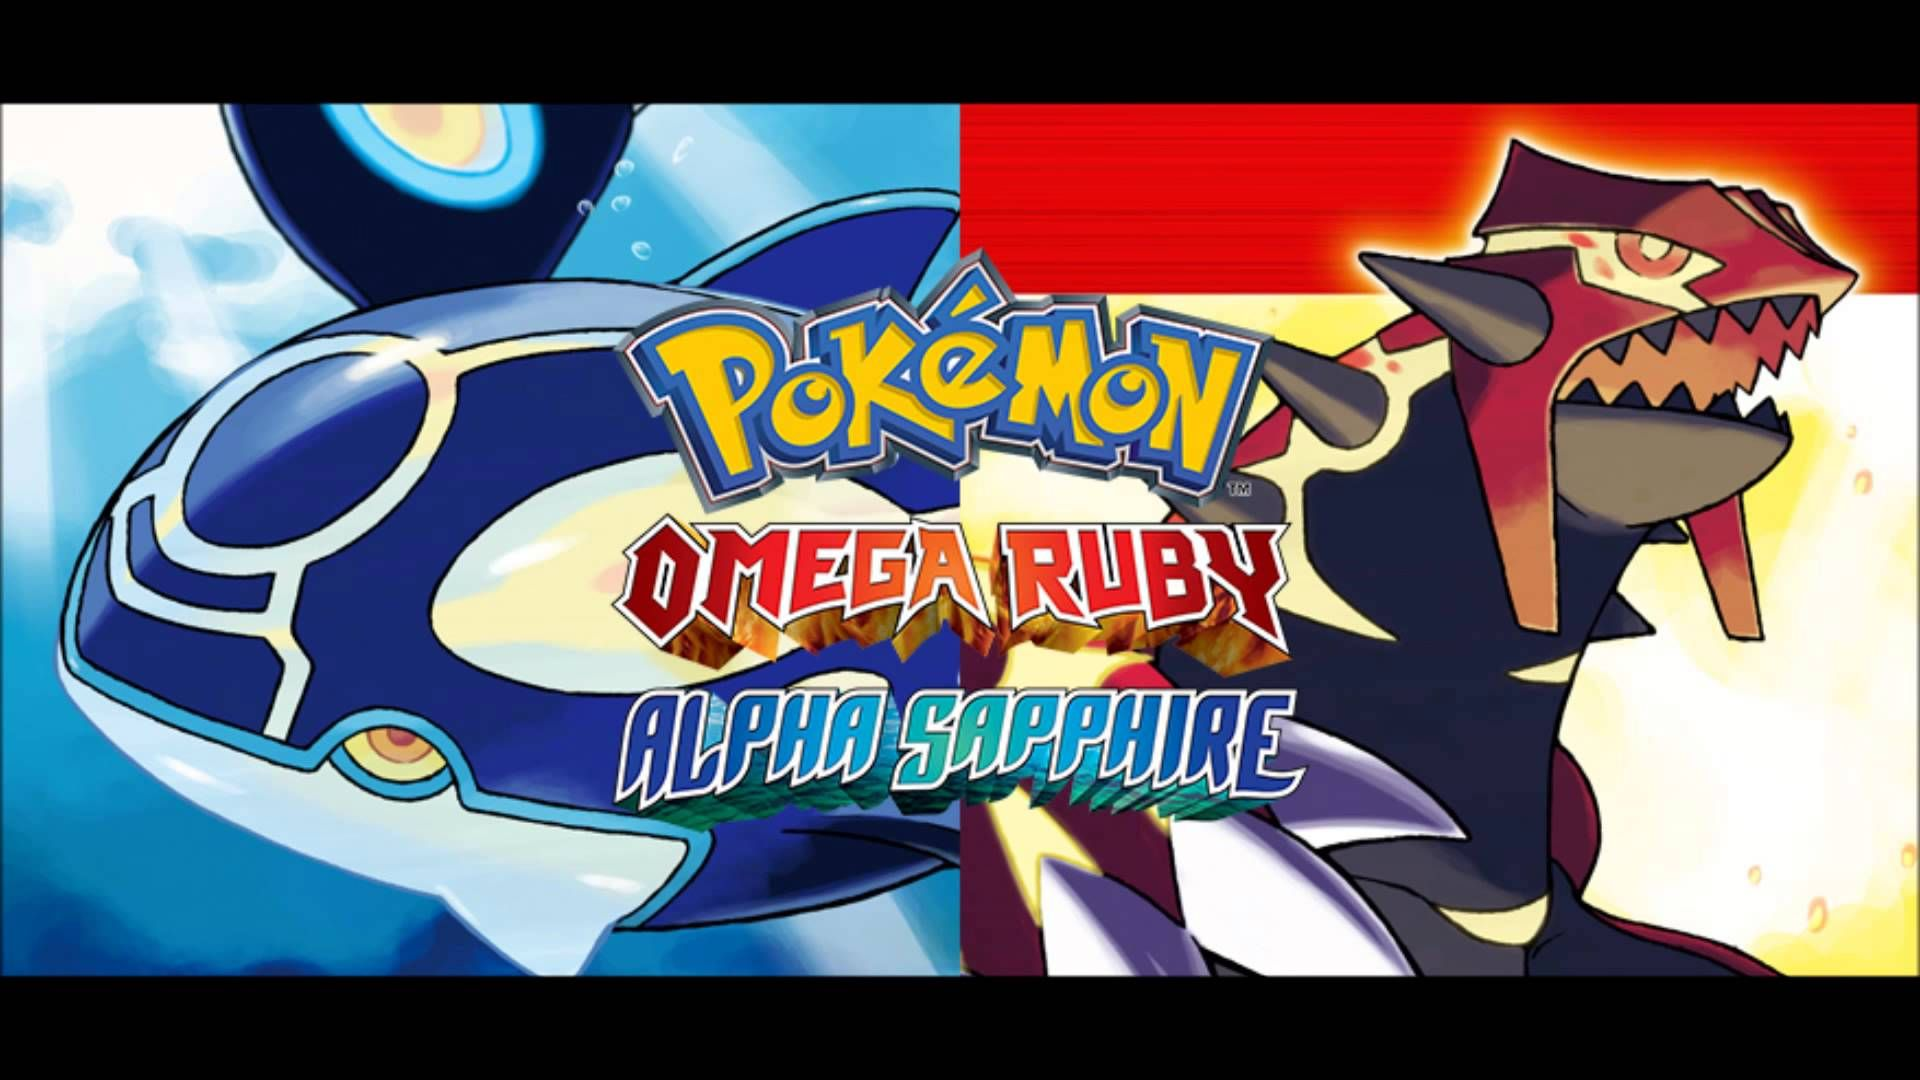 8637b853fa85bbfe898aa6f2f01feacf - How To Get Pokeballs In Pokemon Sun And Moon Demo